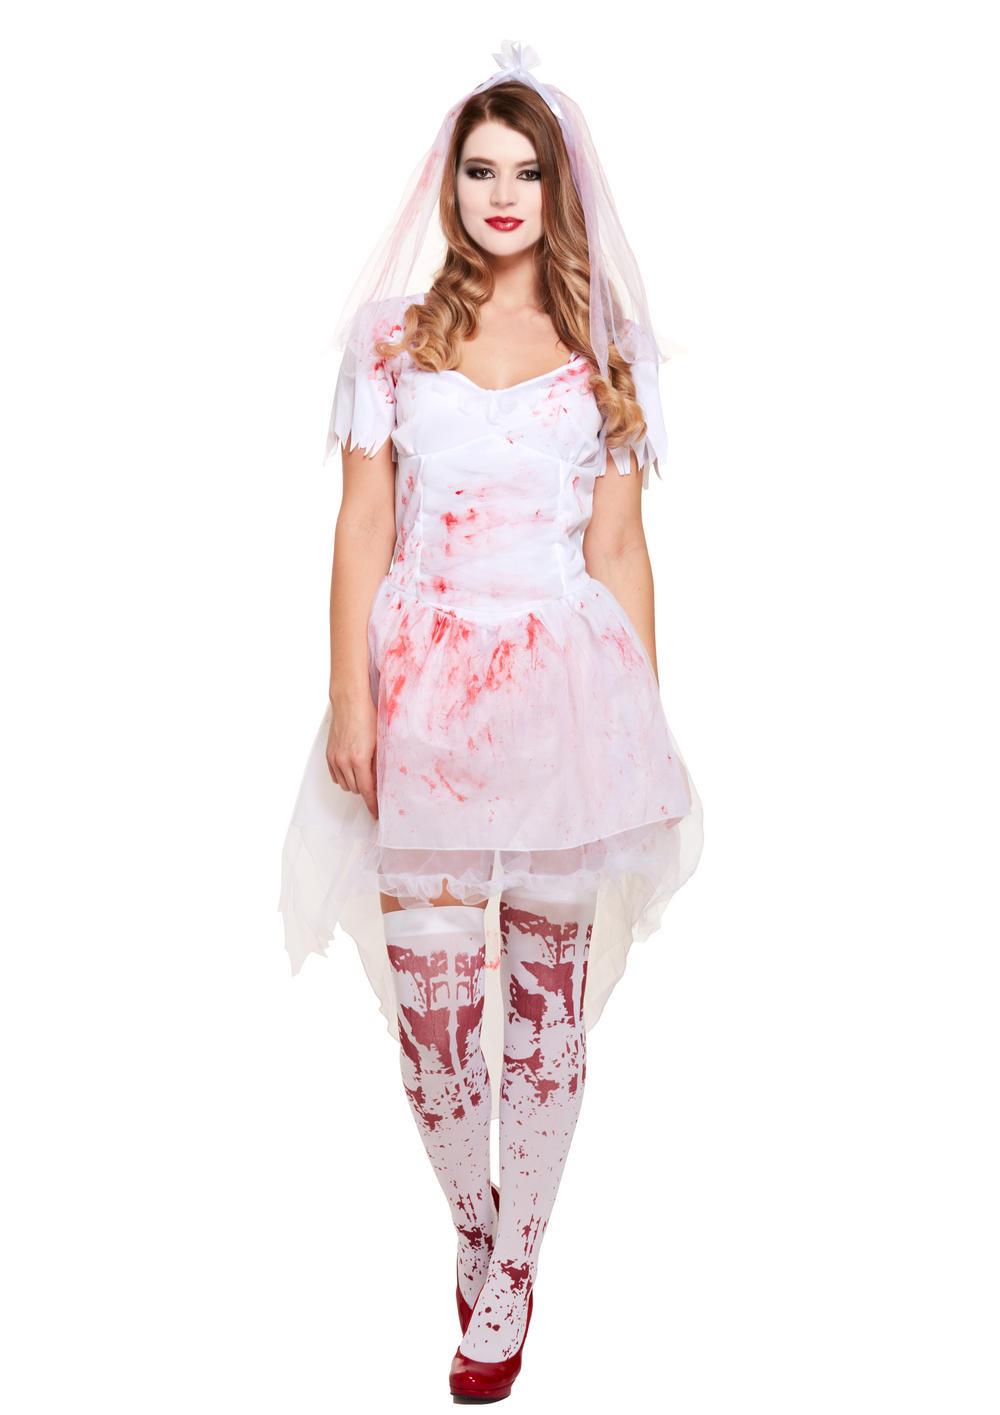 Bloody Bride Ladies Costume